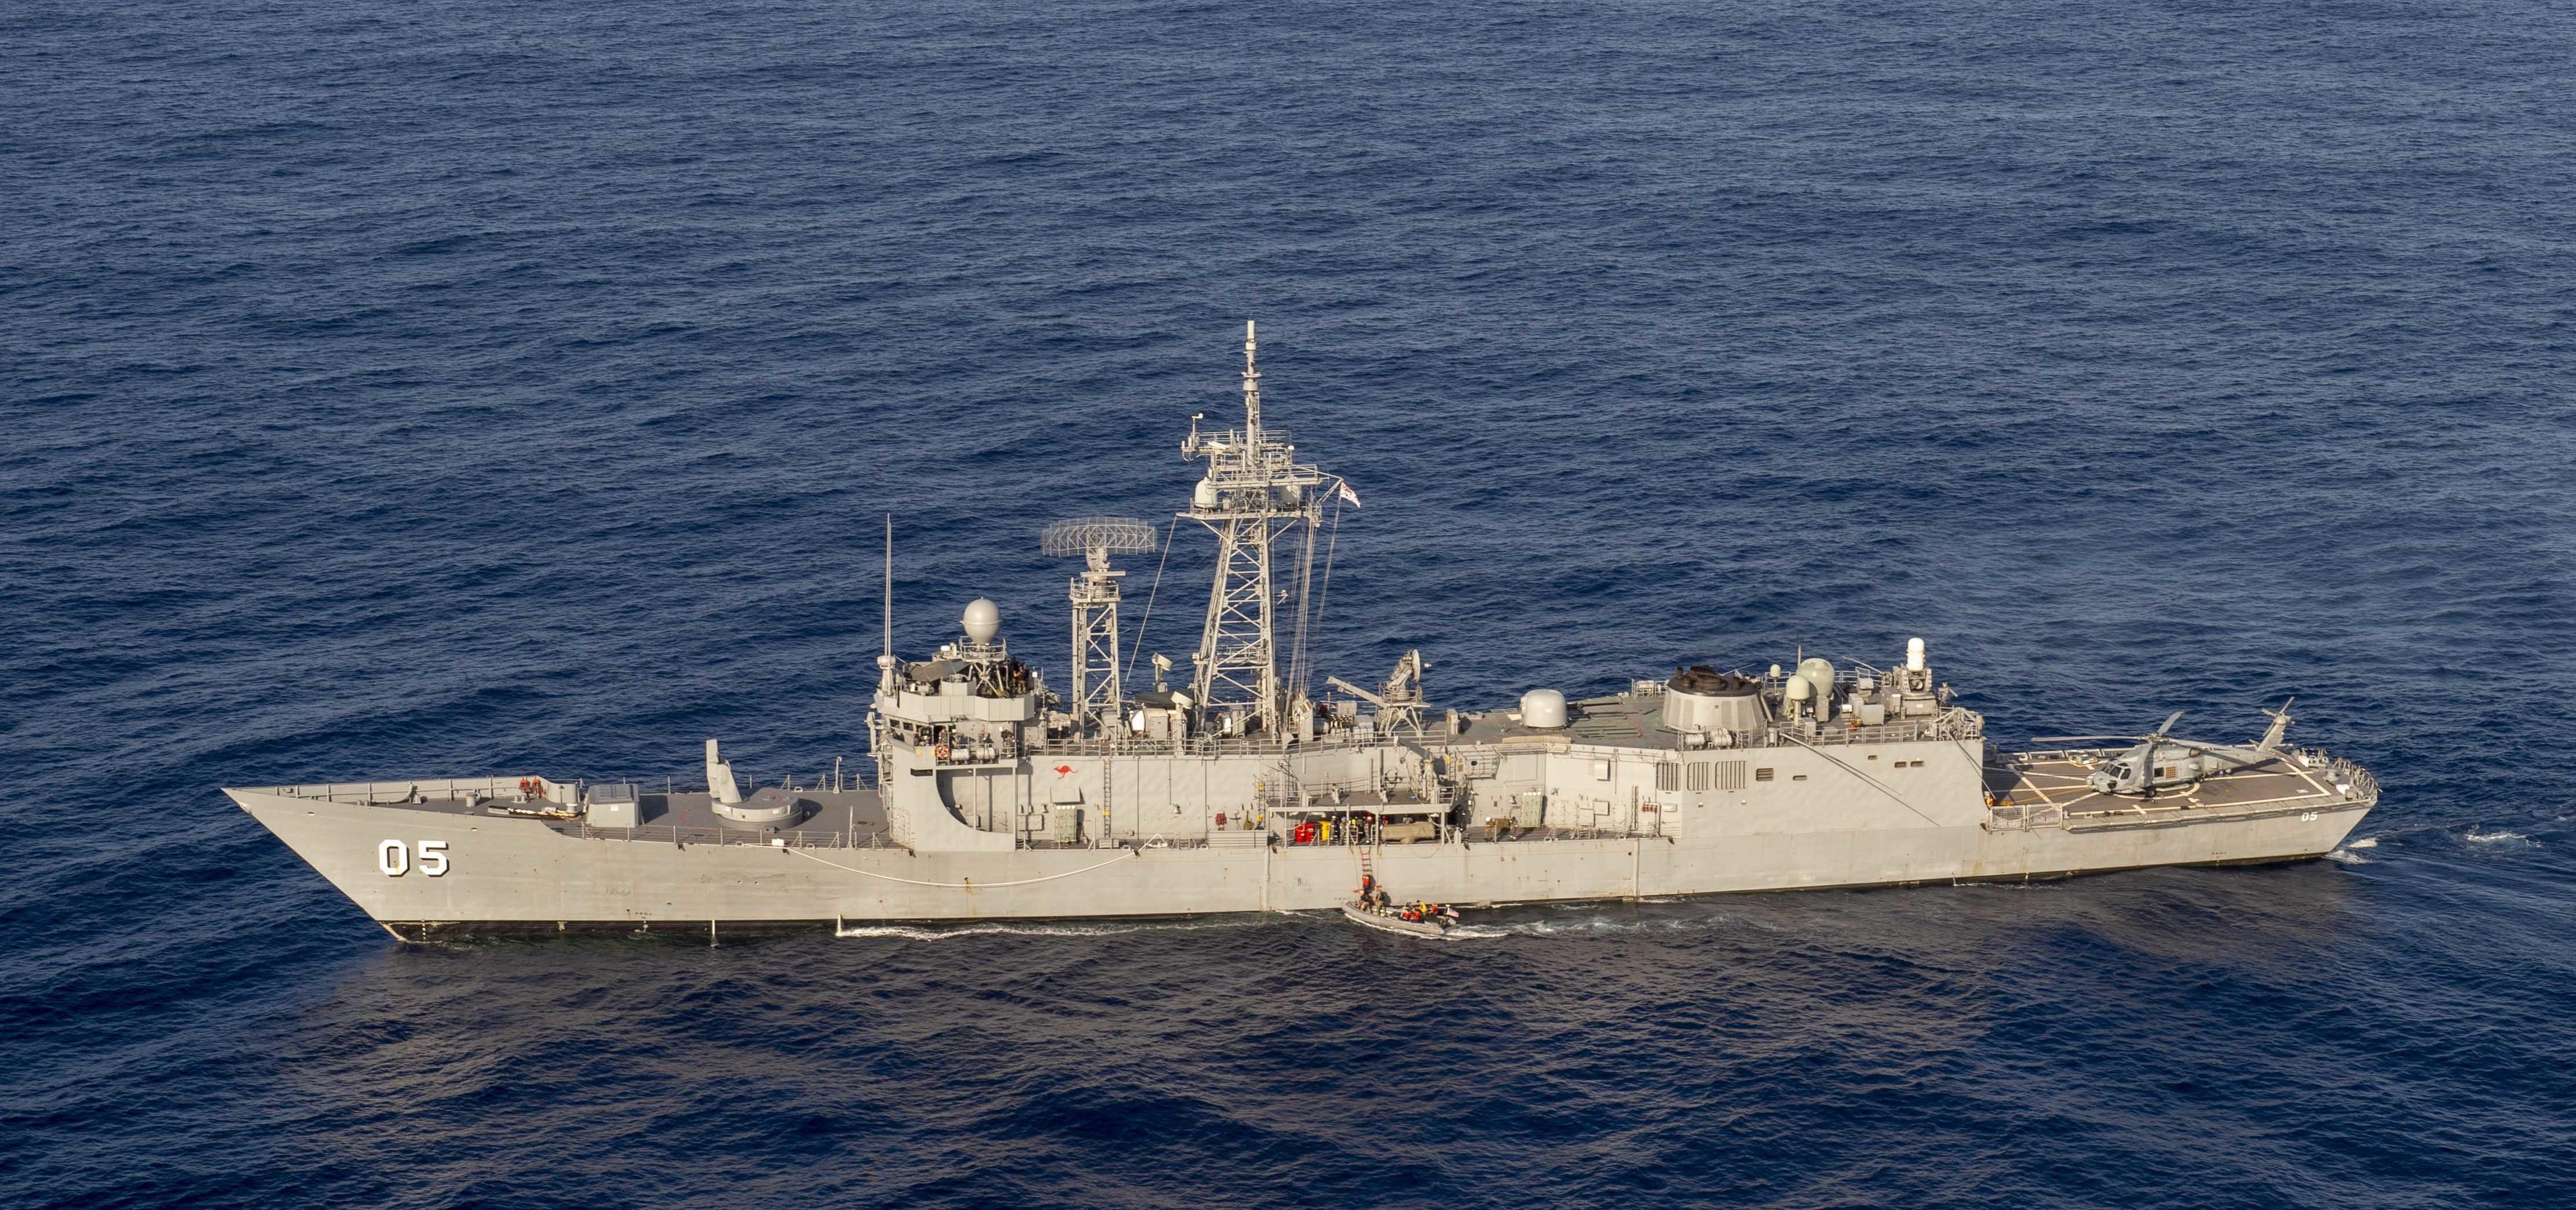 https://upload.wikimedia.org/wikipedia/commons/d/d0/HMAS_Melbourne_%28FFG_05%29_underway_in_the_Philipine_Sea_on_18_April_2019_%28190418-N-UI104-0759%29.JPG